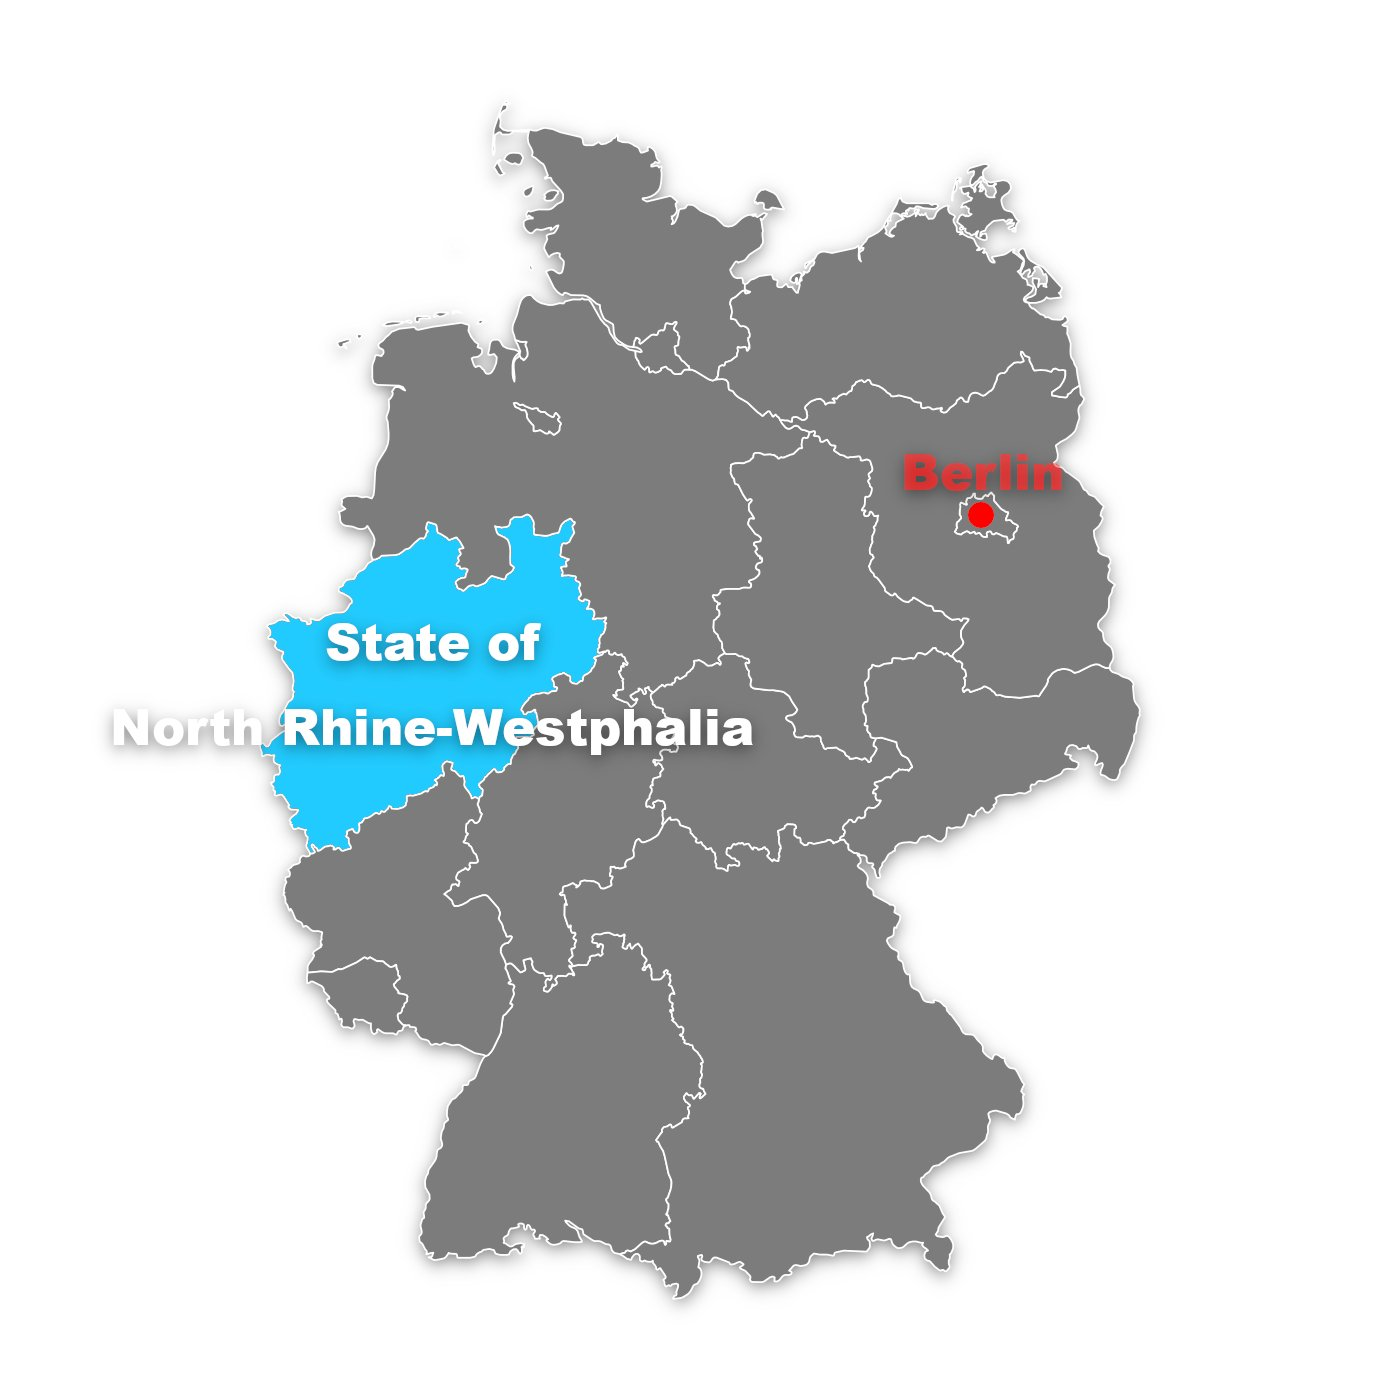 state of north rhine-westphalia in germany